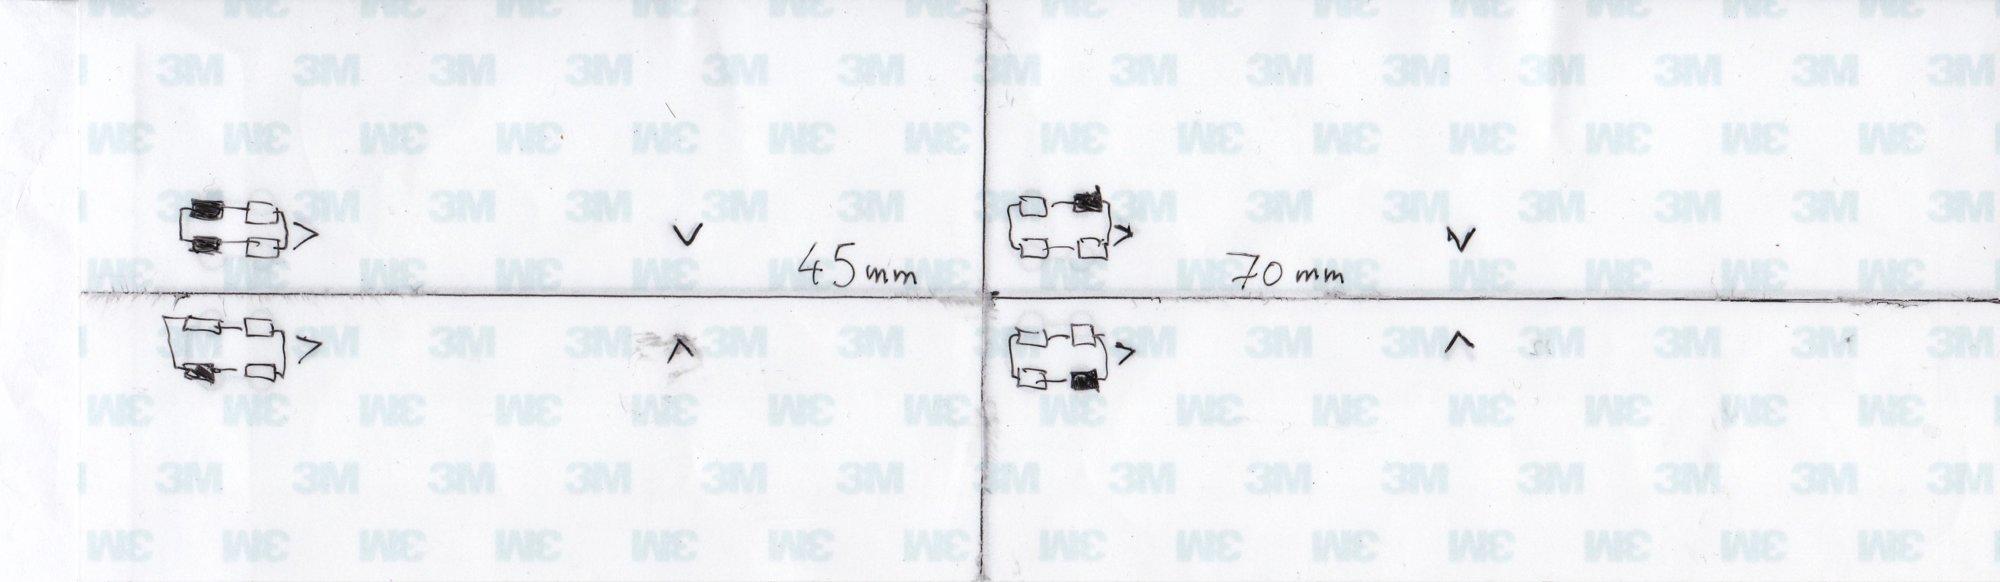 tesla-model-3-roof-rack-anti-abresion-tape-measurement-jpg.431547